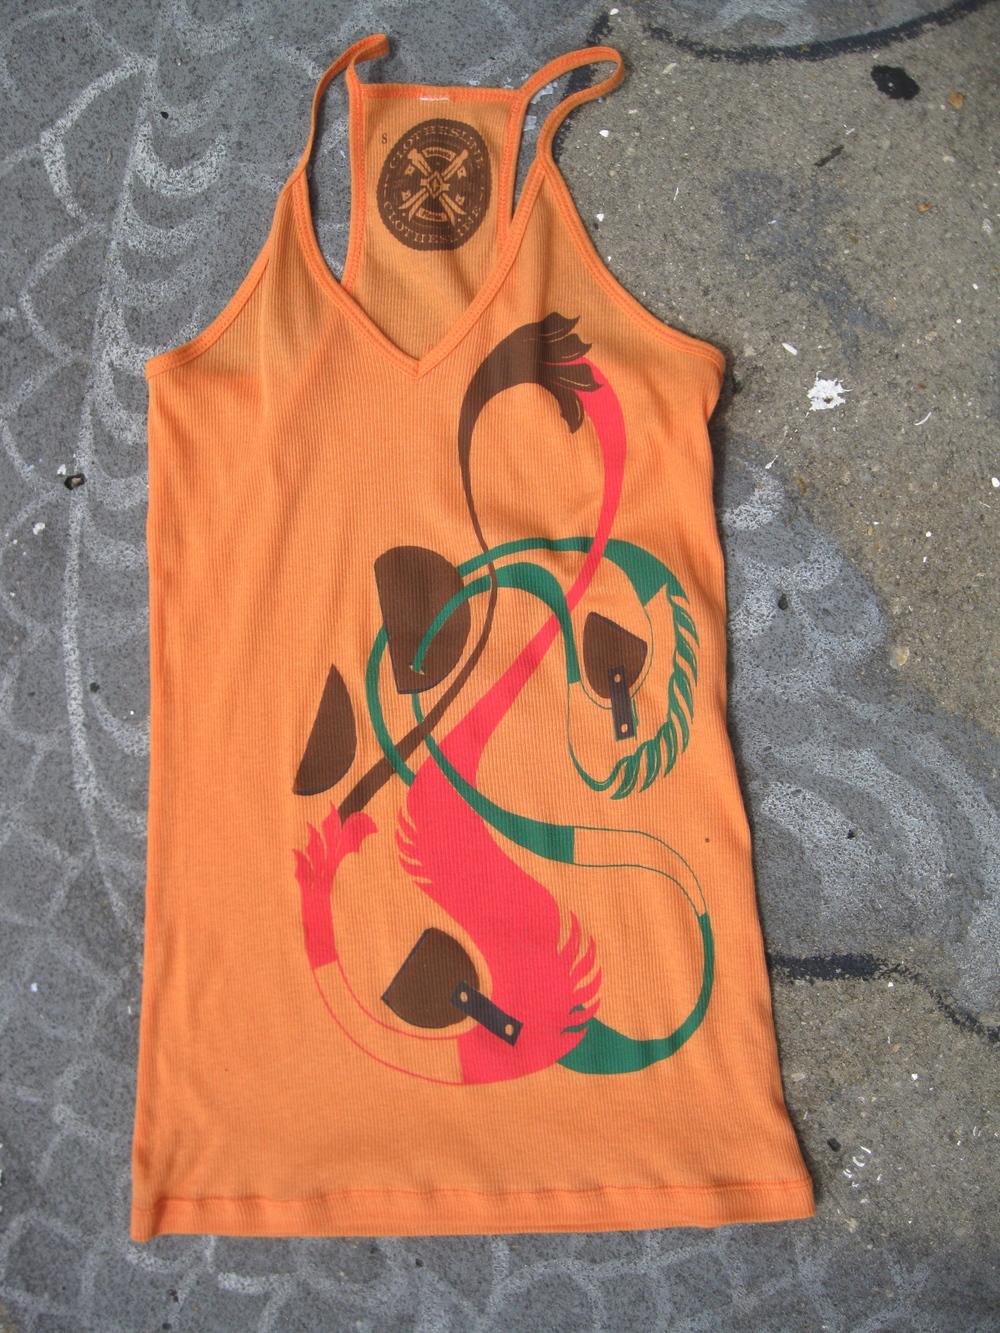 Orange tank.JPG